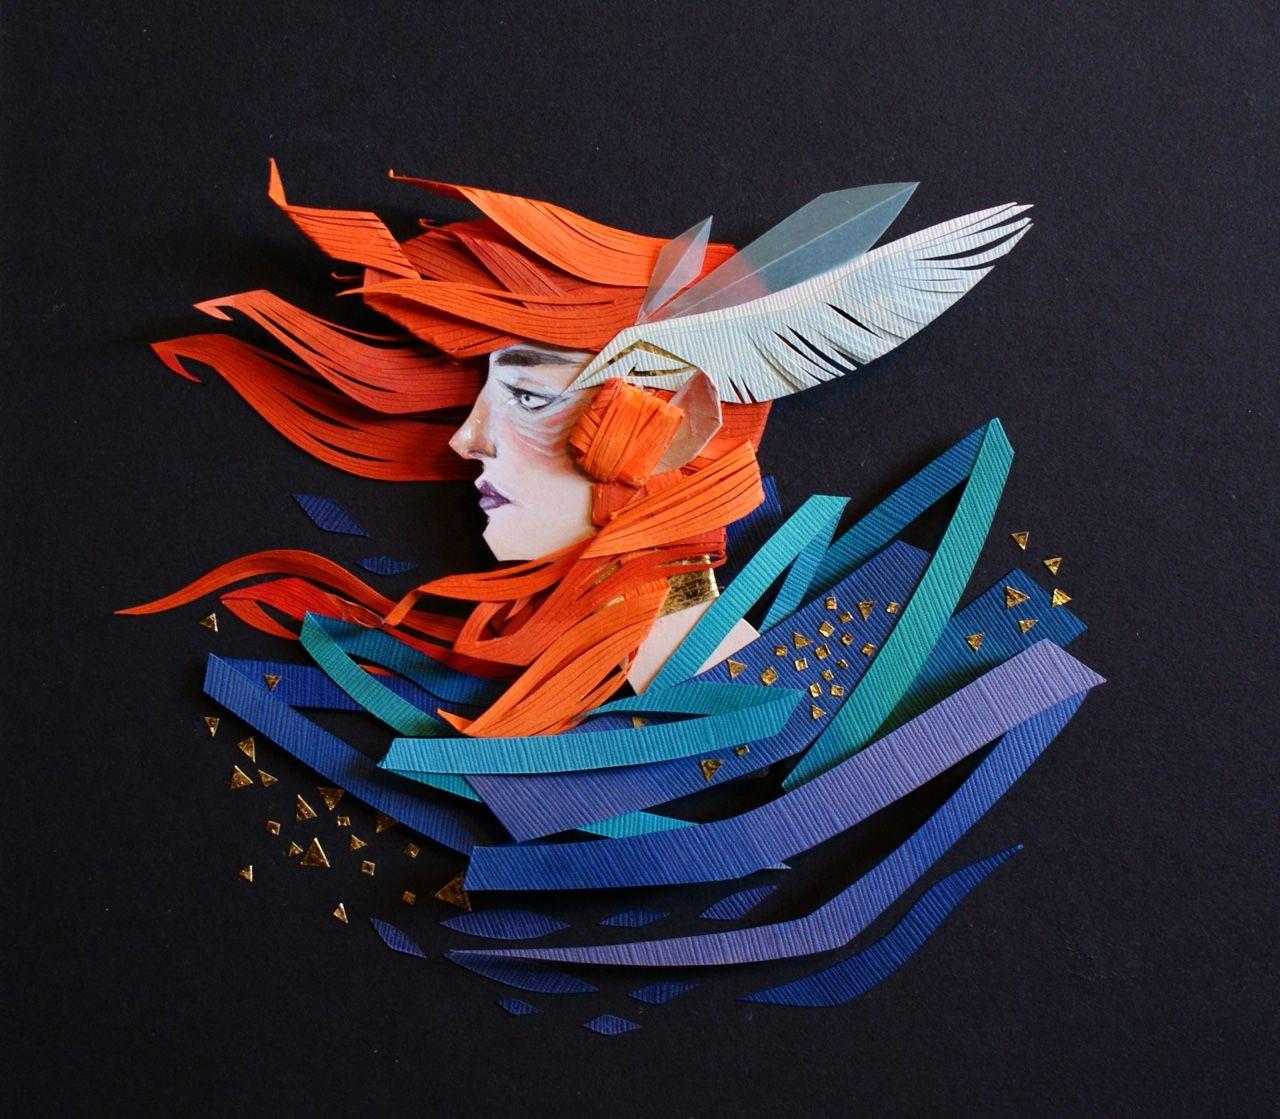 art   morgana.wallace.artwork@gmail.com / Madrona Gallery / PRINTS / Instagram